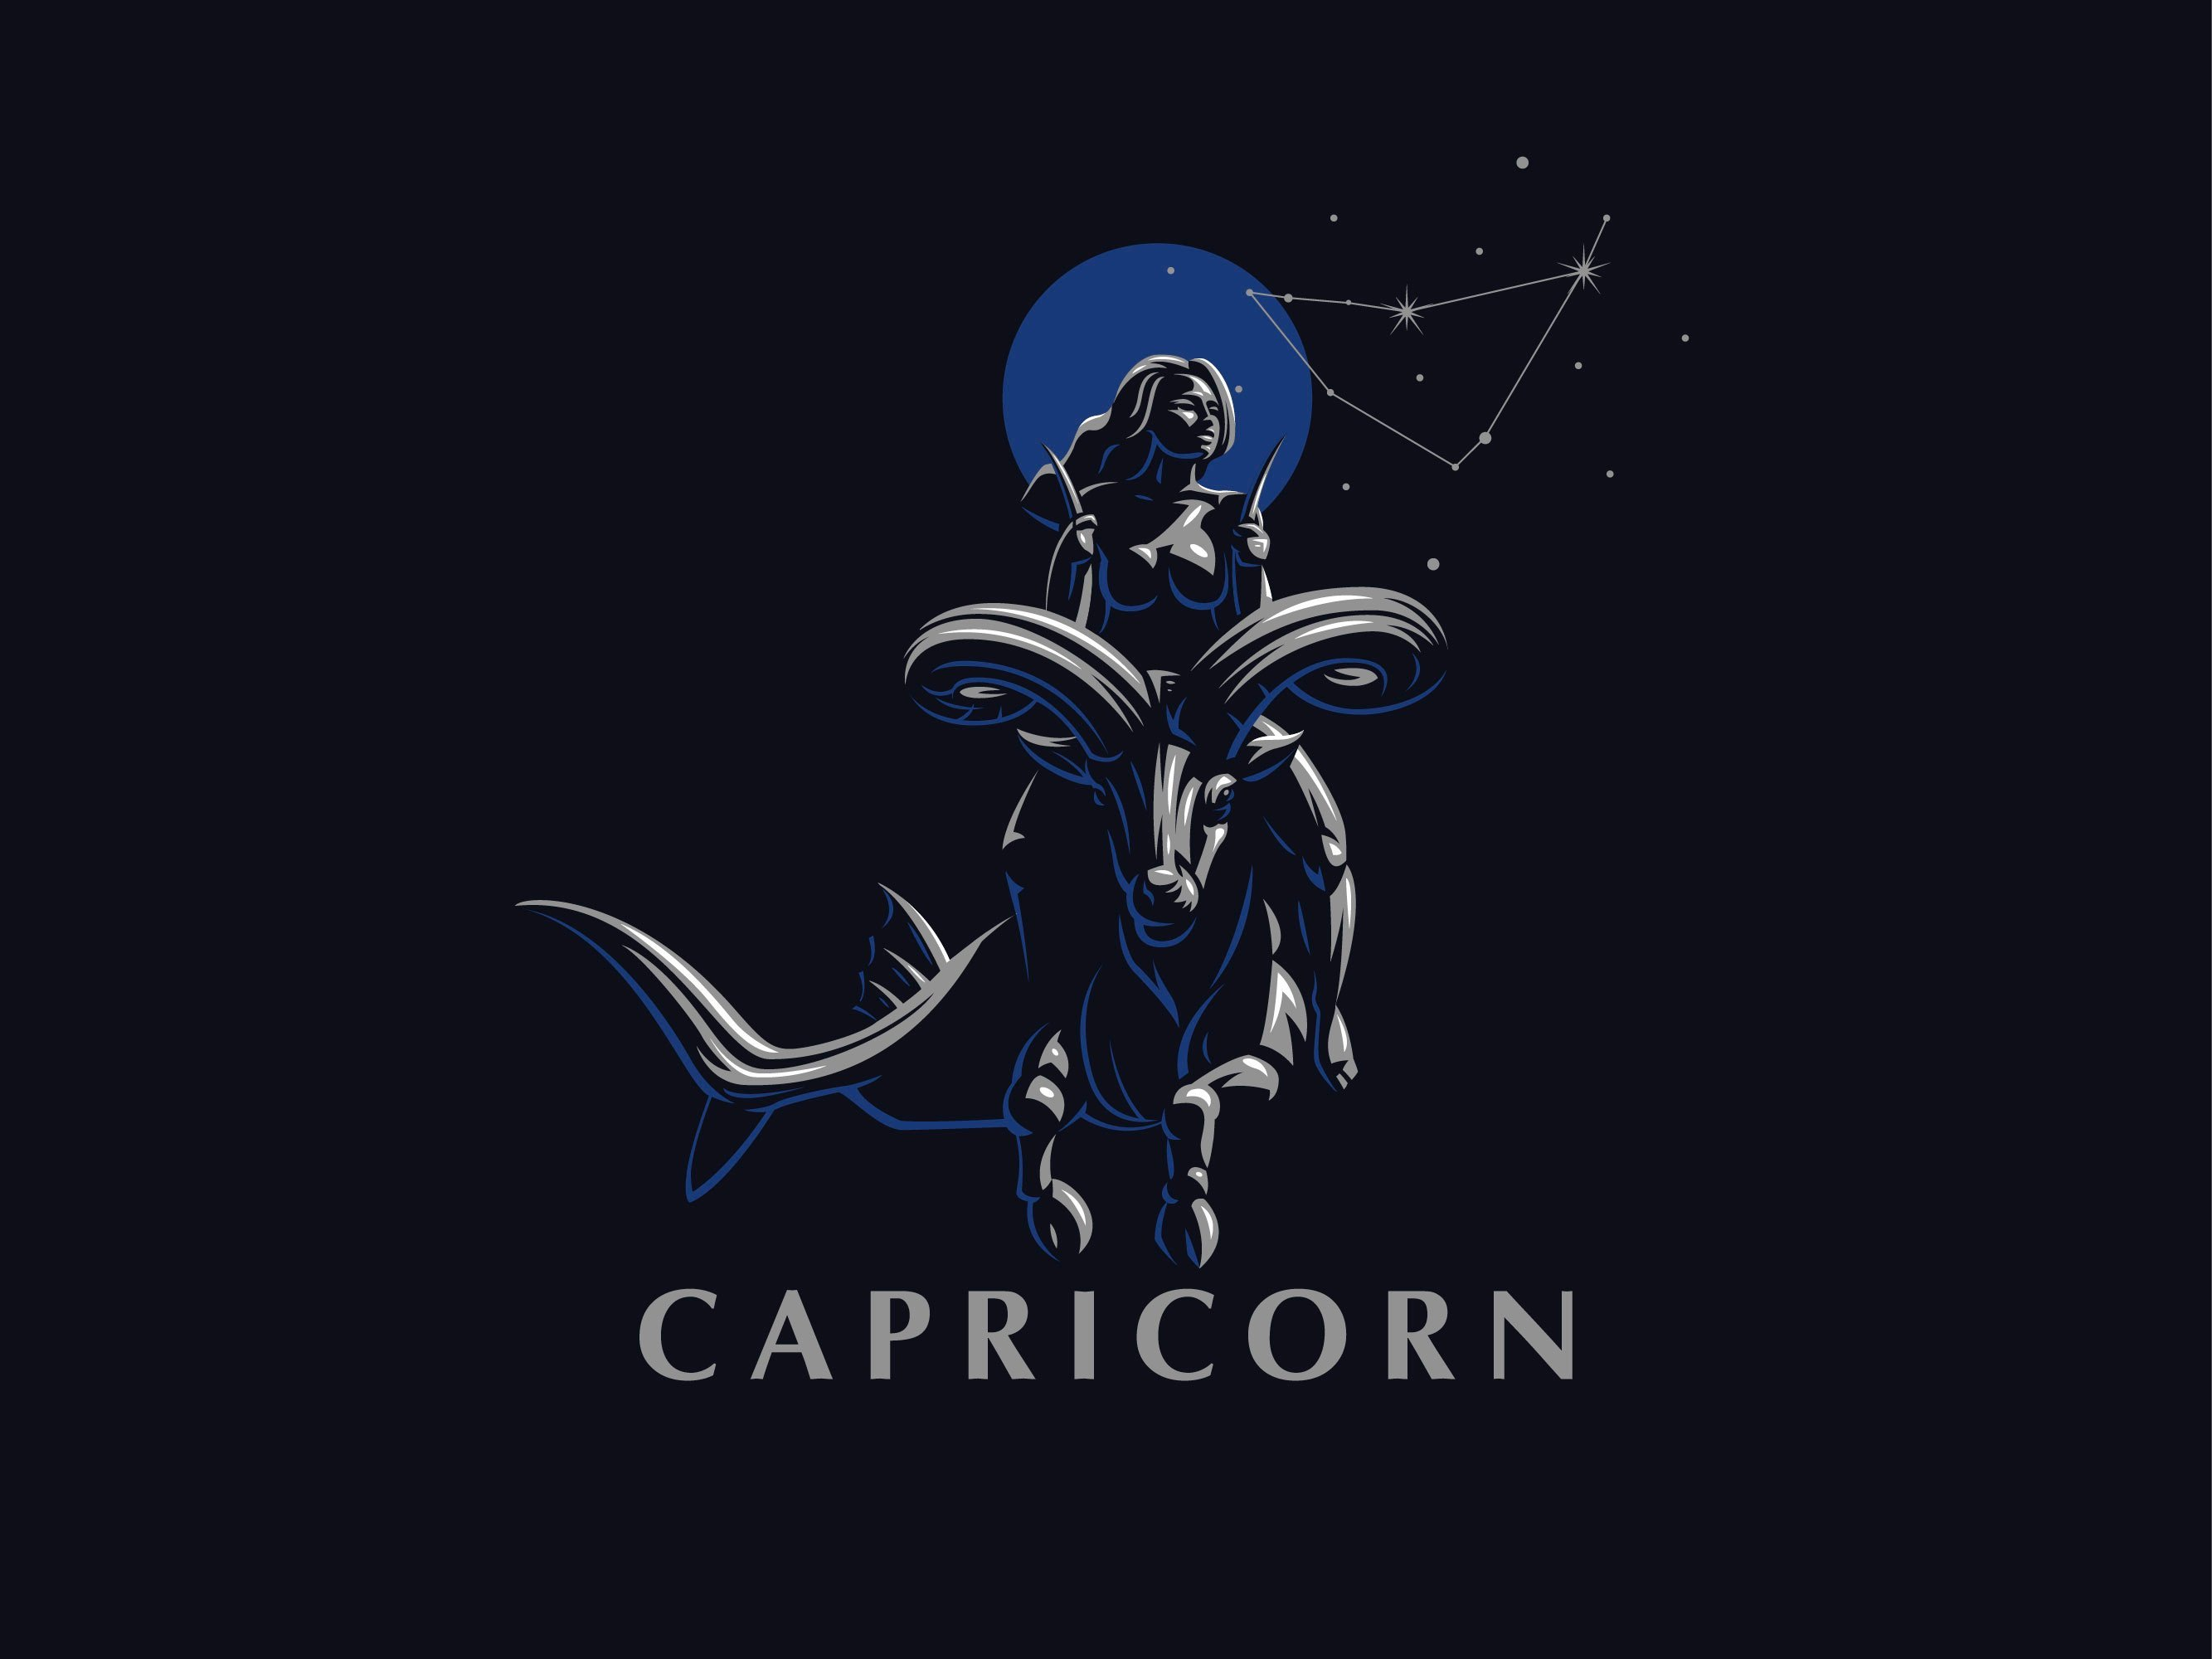 Capricornio. |Imagen: Shutterstock